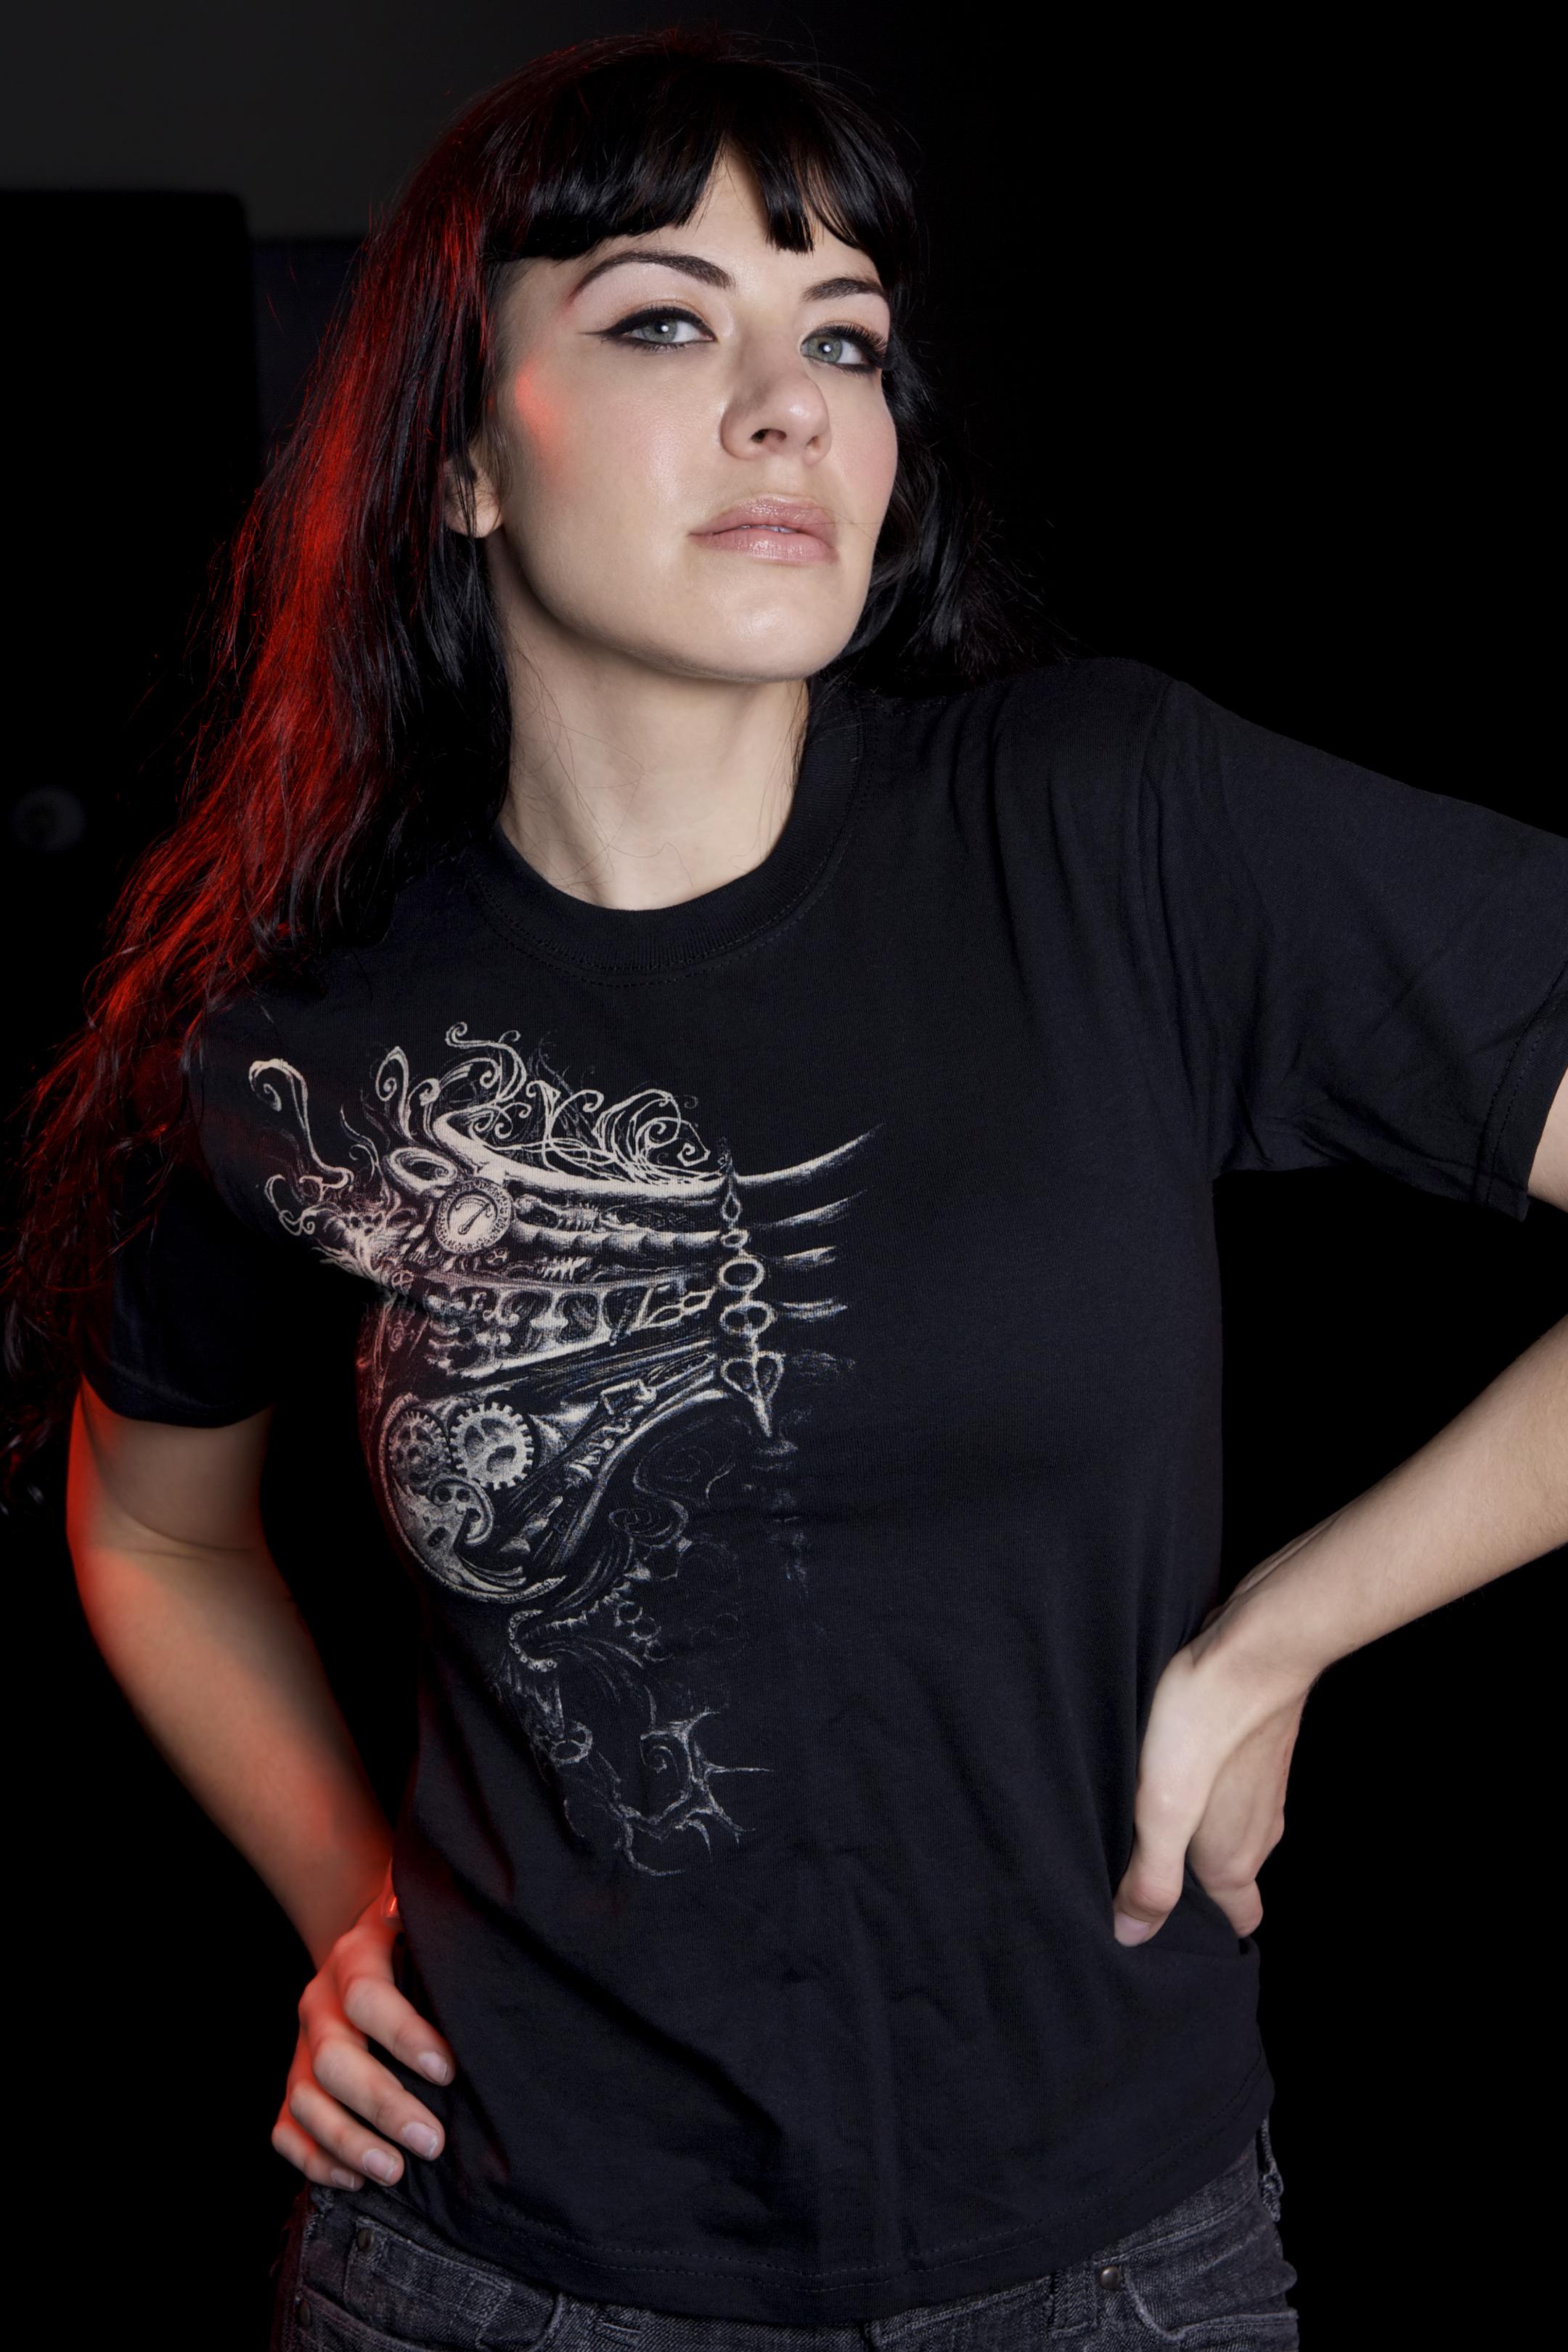 Nightmare Shirts Ribcage design